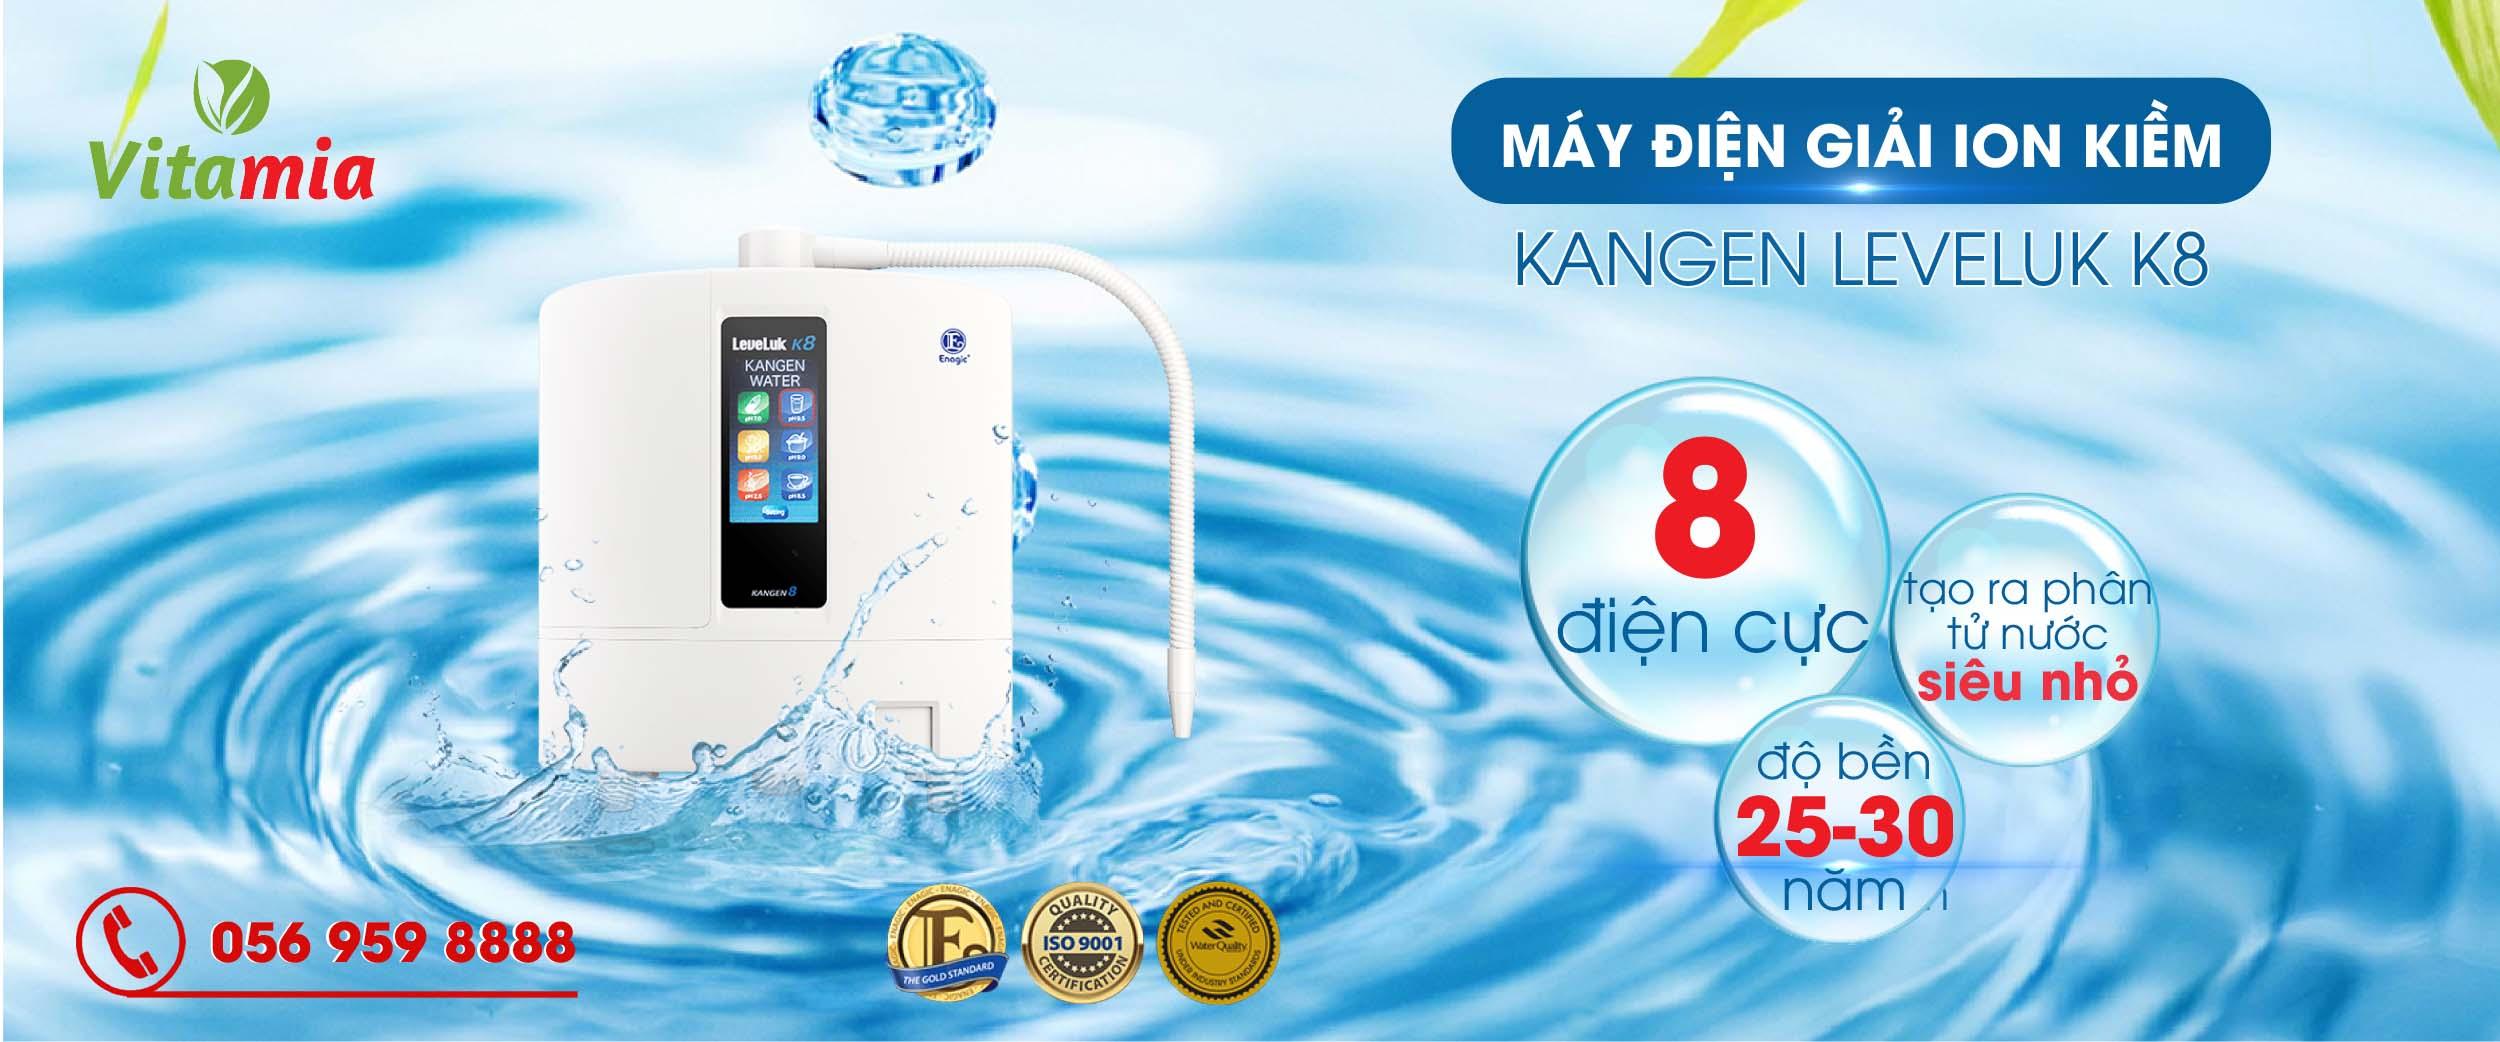 Máy lọc nước ion kiềm Kangen Leveluk K8